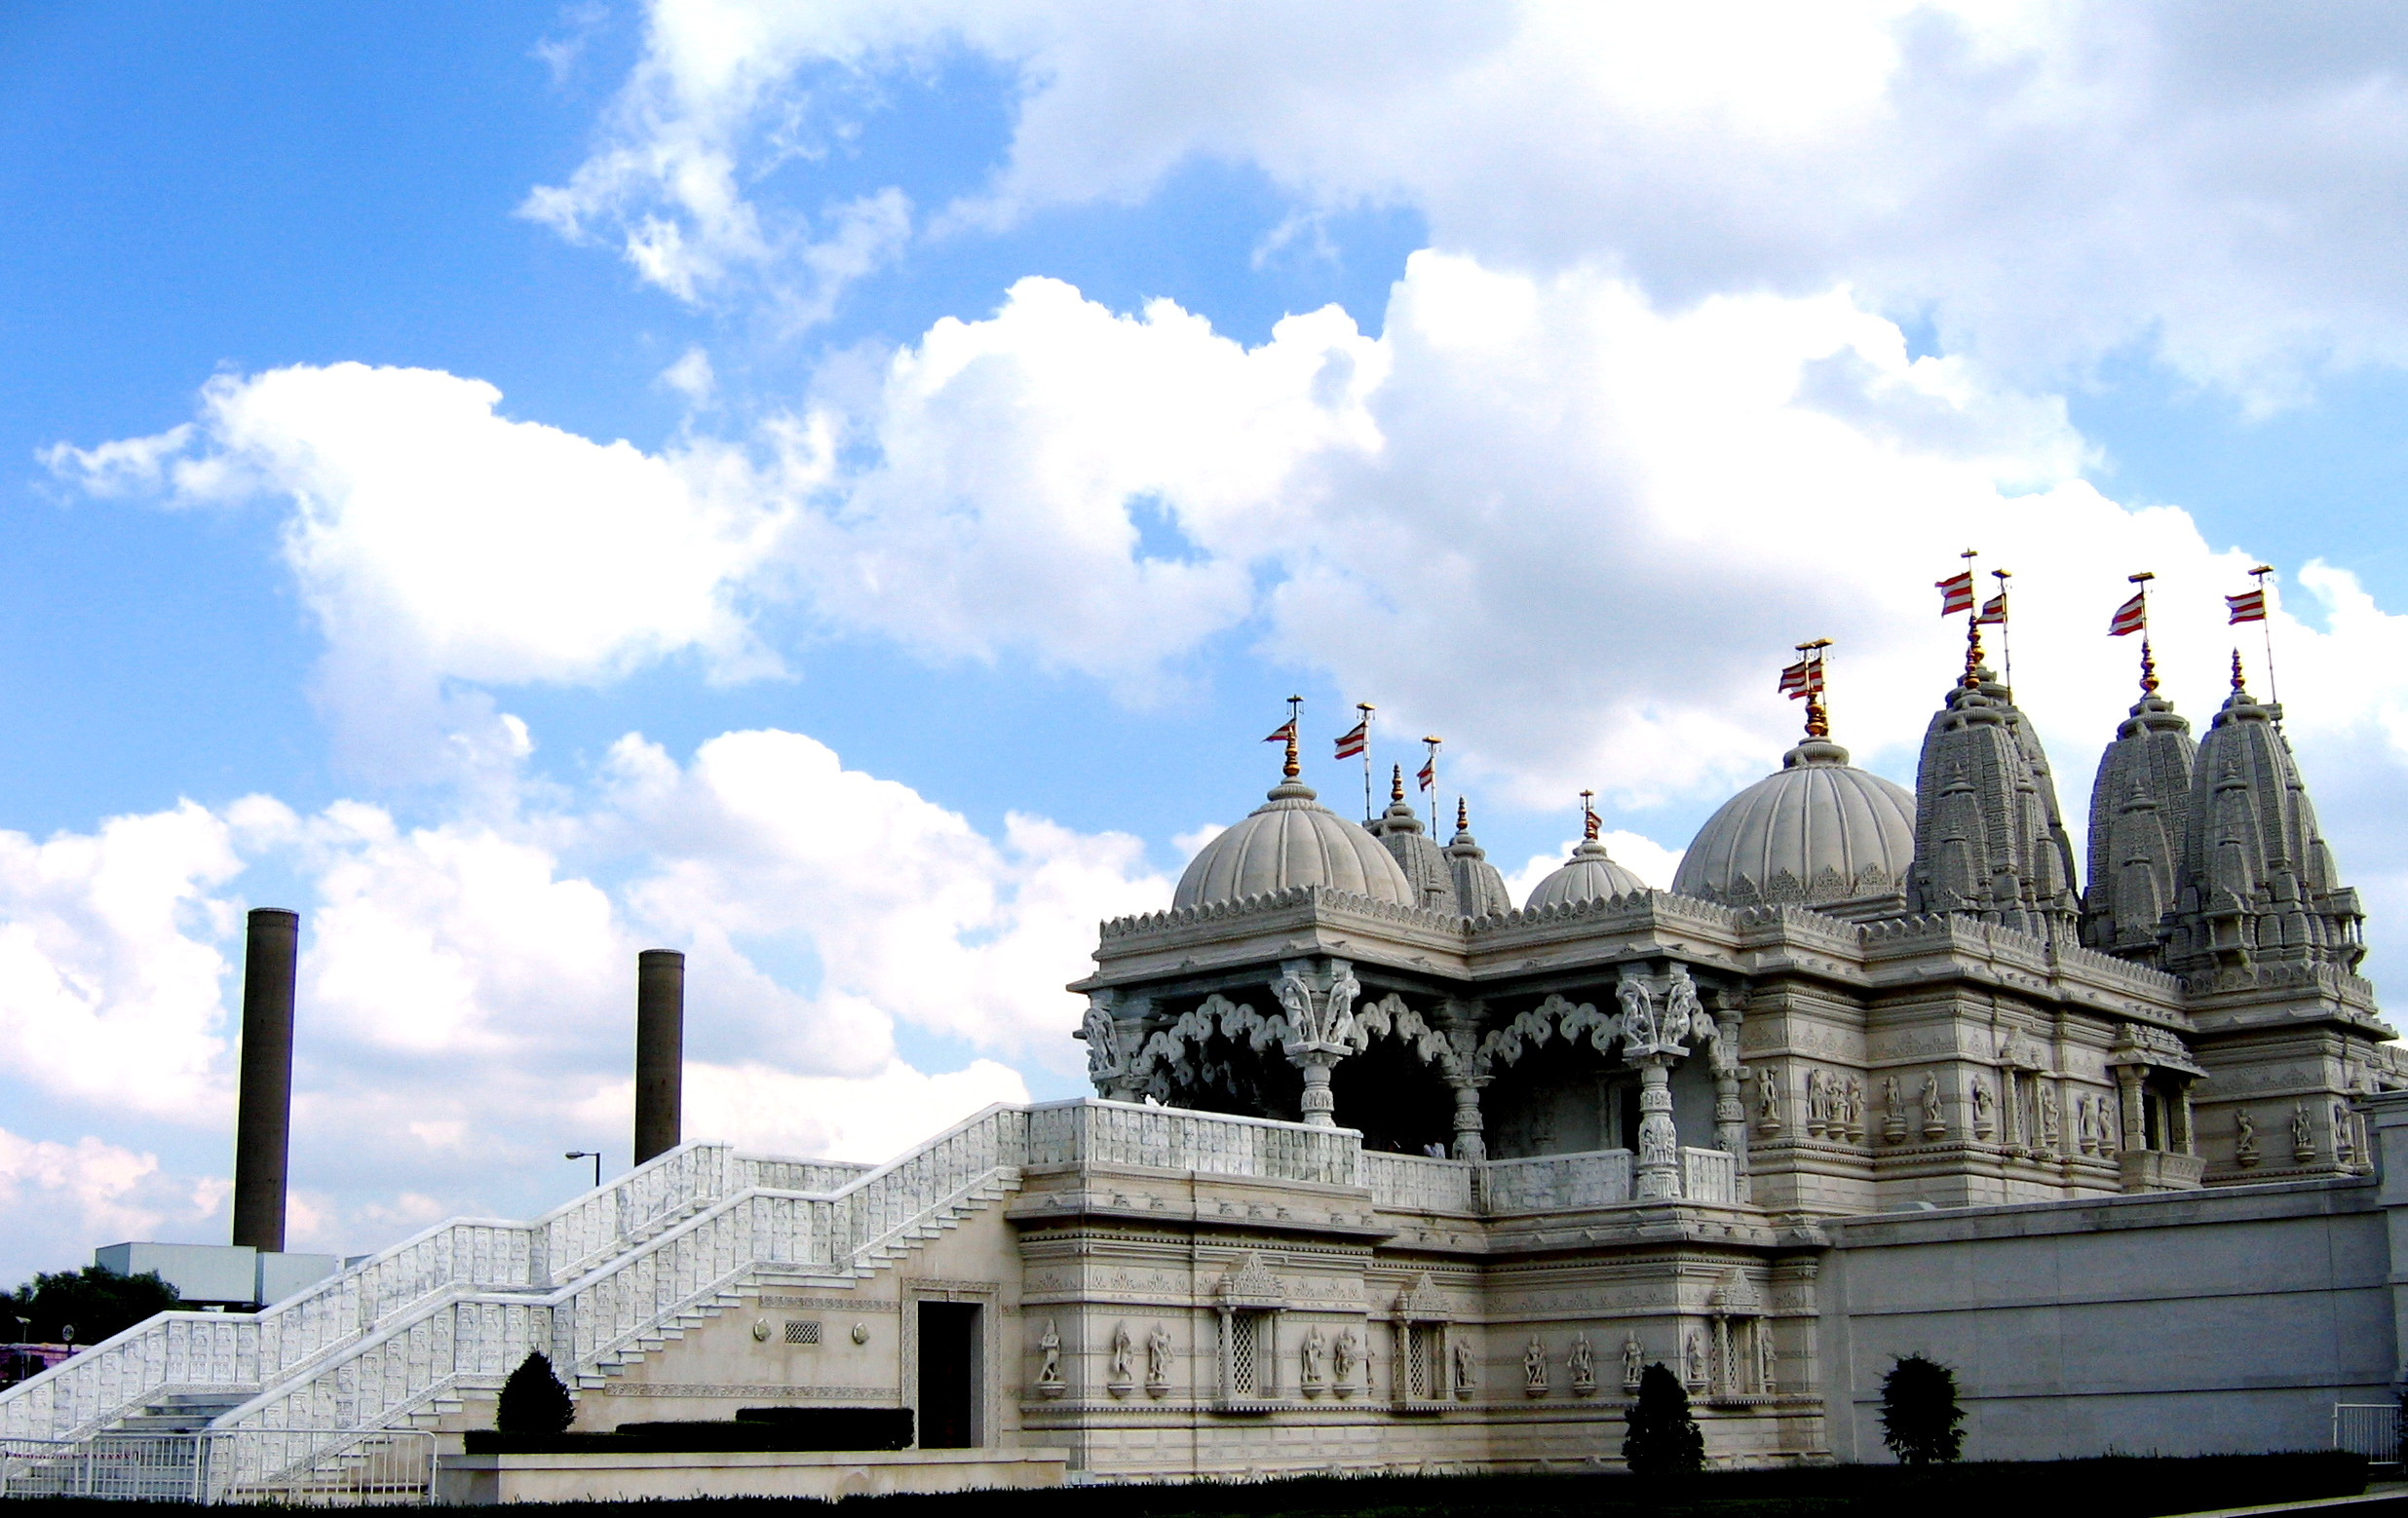 Swaminarayan dating site